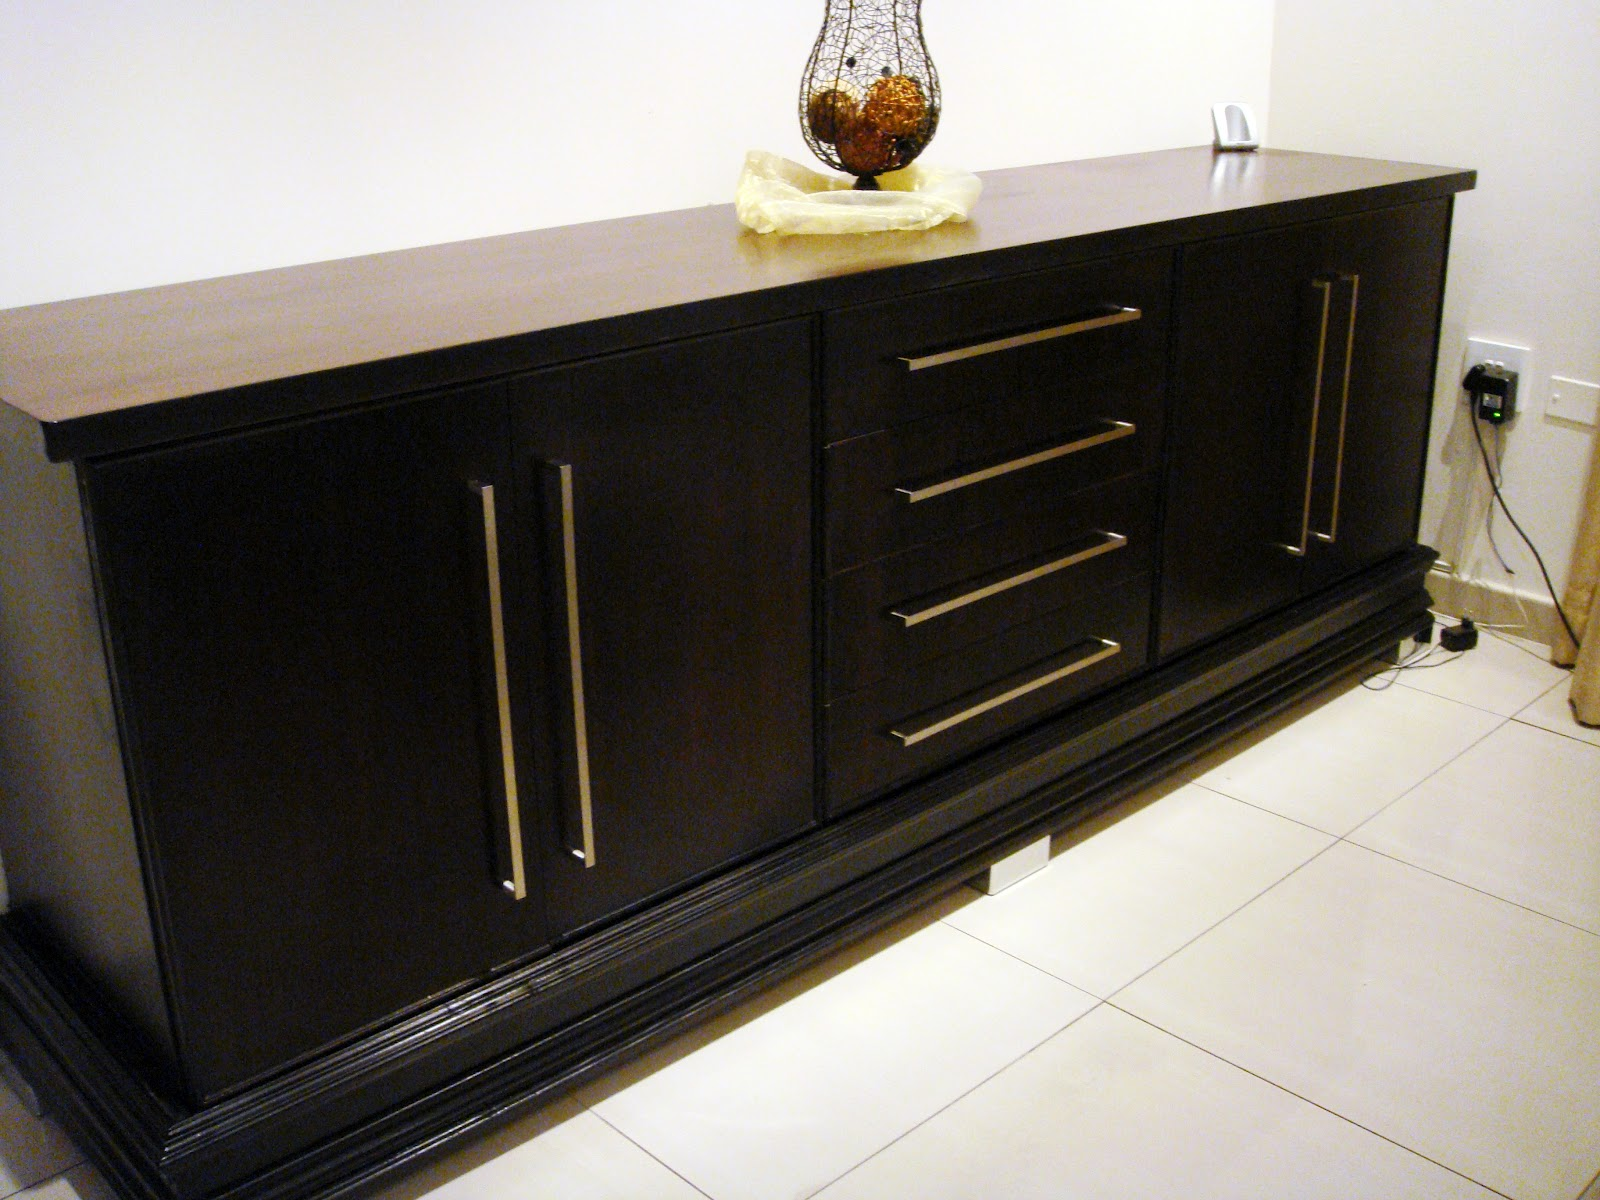 sideboard for dining room | Custom Carpentry: Dining Room Sideboard